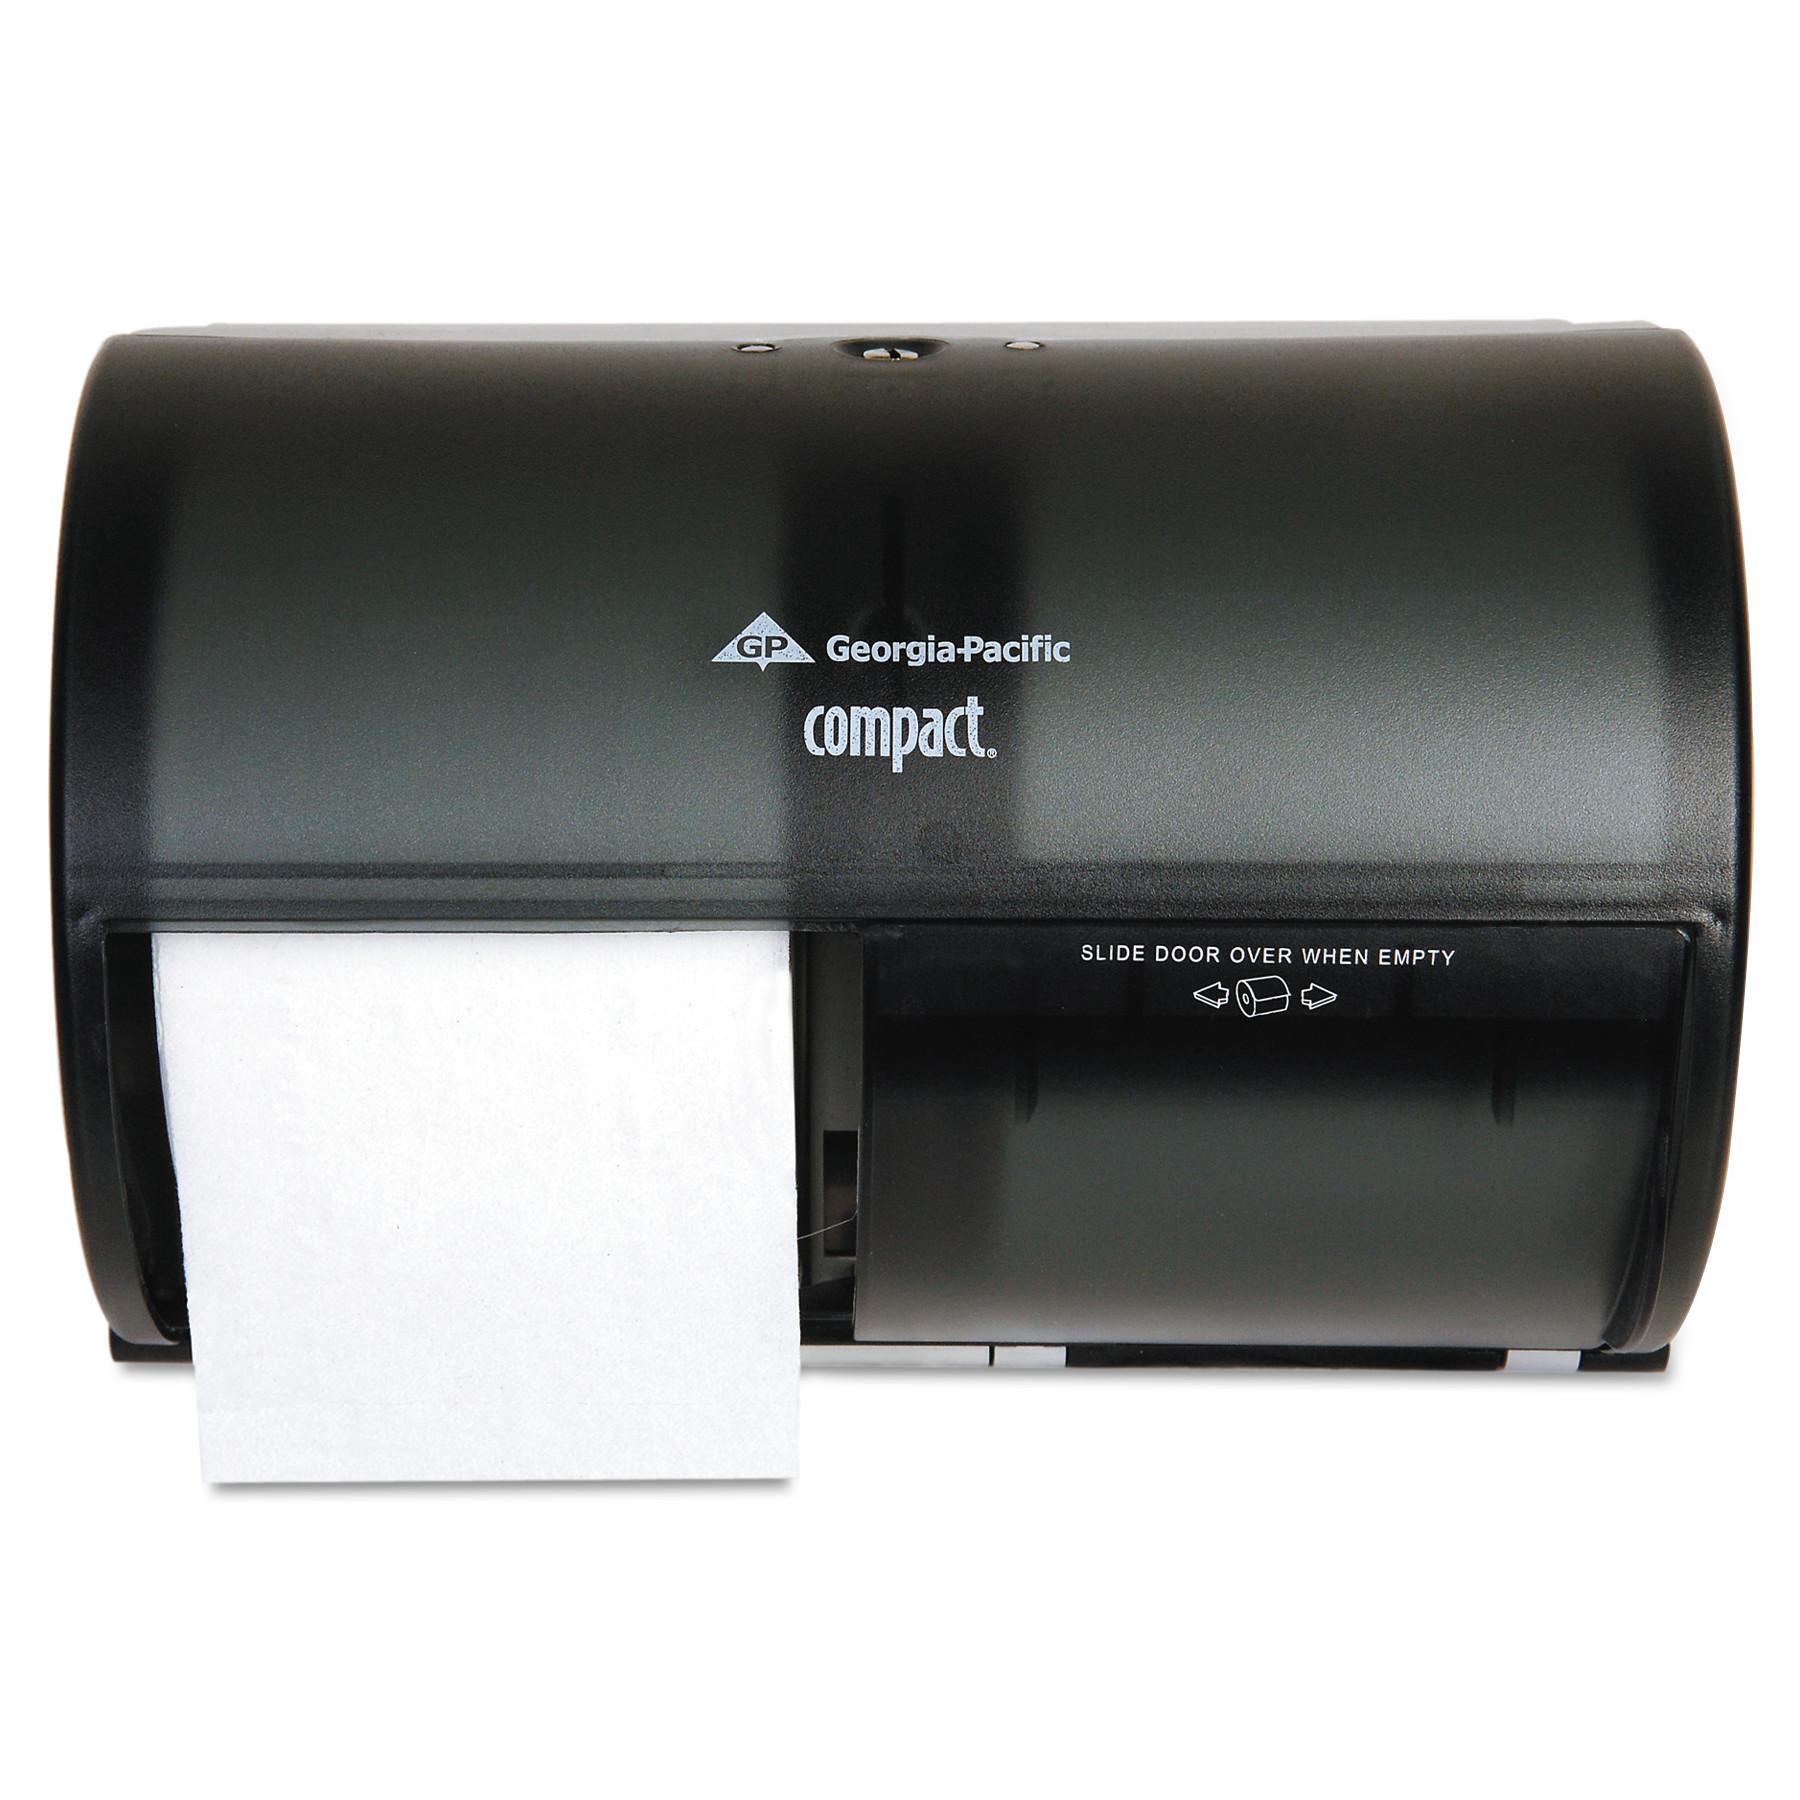 Georgia Pacific Professional Coreless Double Roll Tissue Dispenser, 10 1/8 x 6 3/4 x 7 1/8, Smoke/Gray